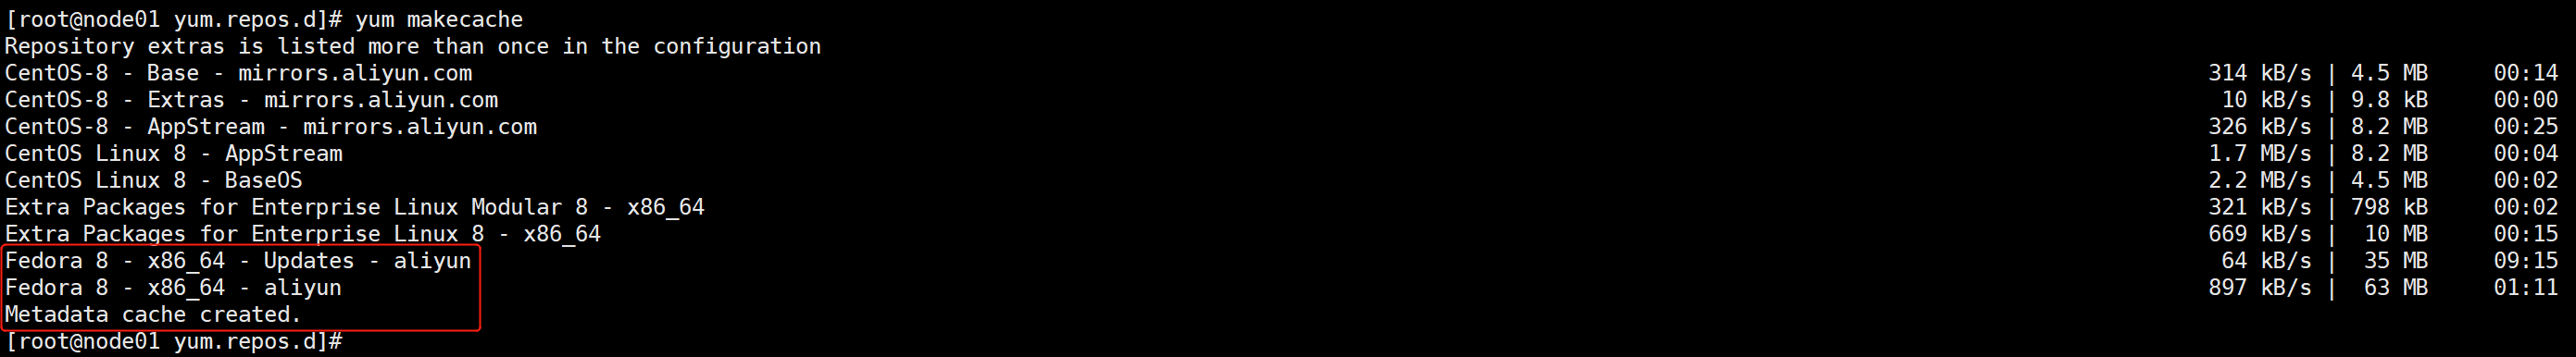 Fedora.png